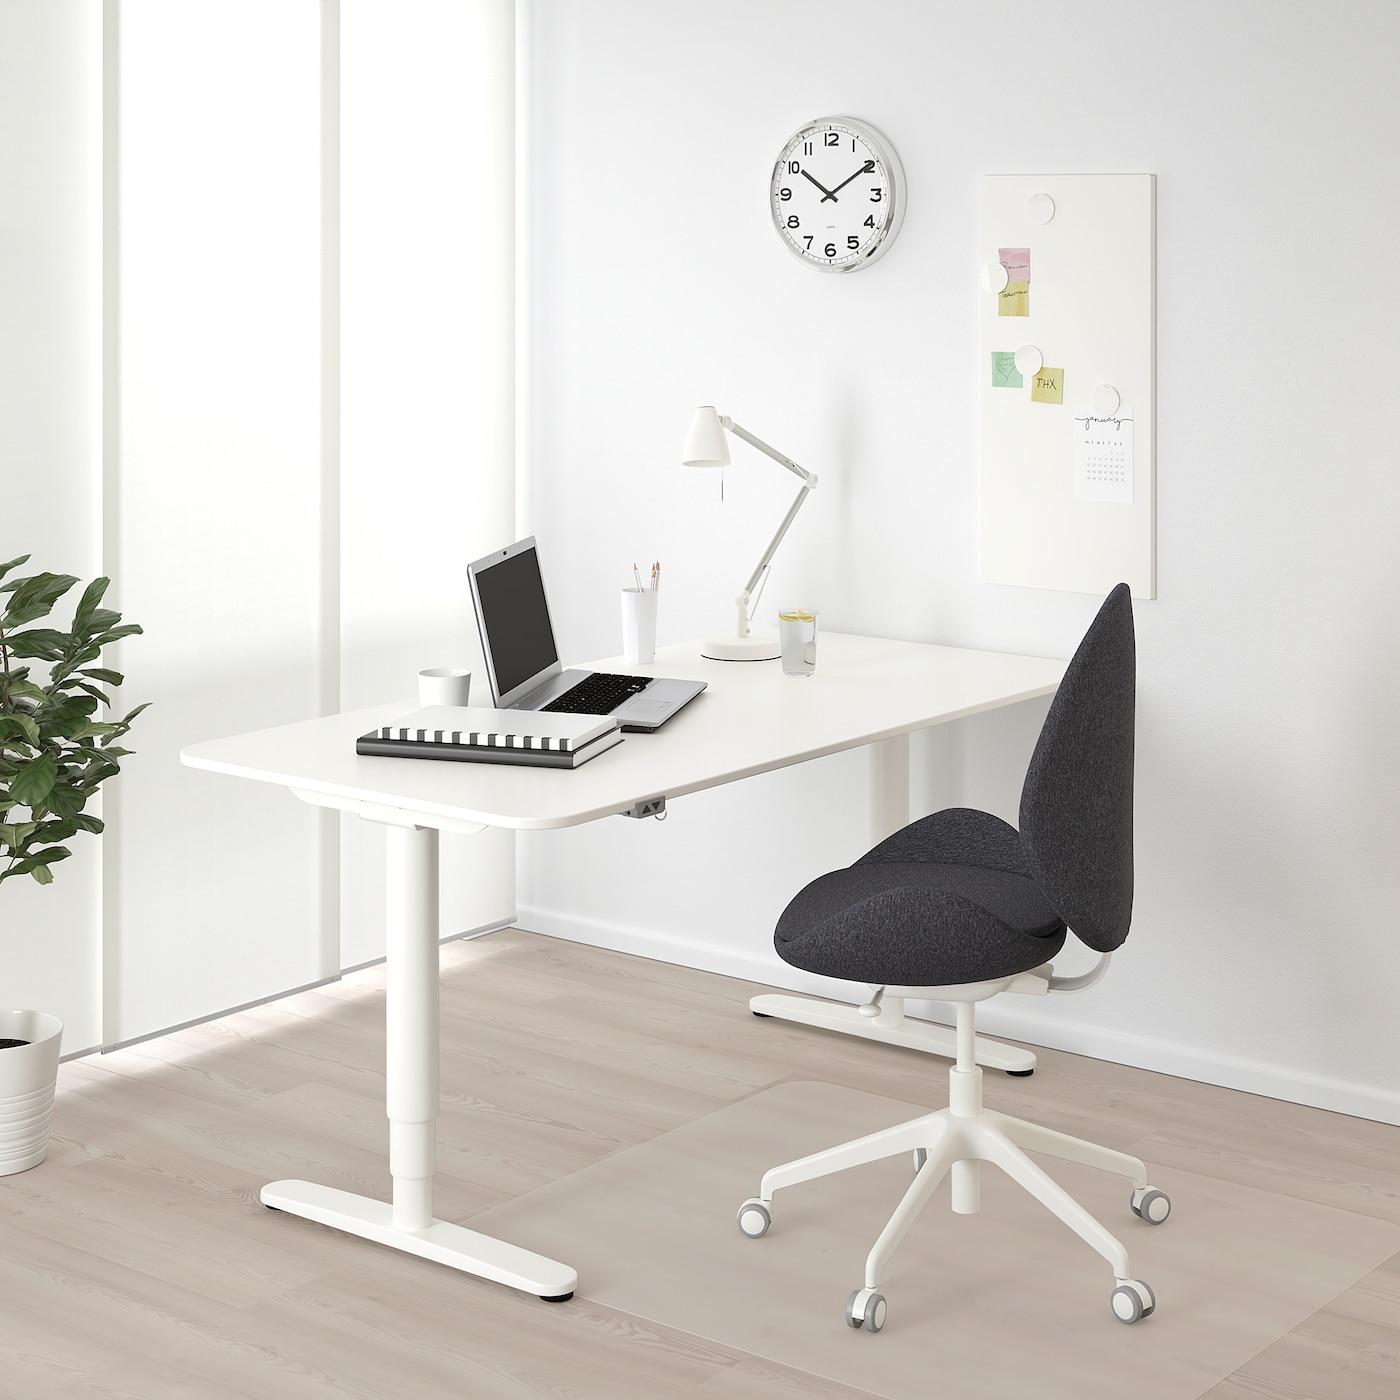 Bekant White Desk Sit Stand 160x80 Cm Ikea